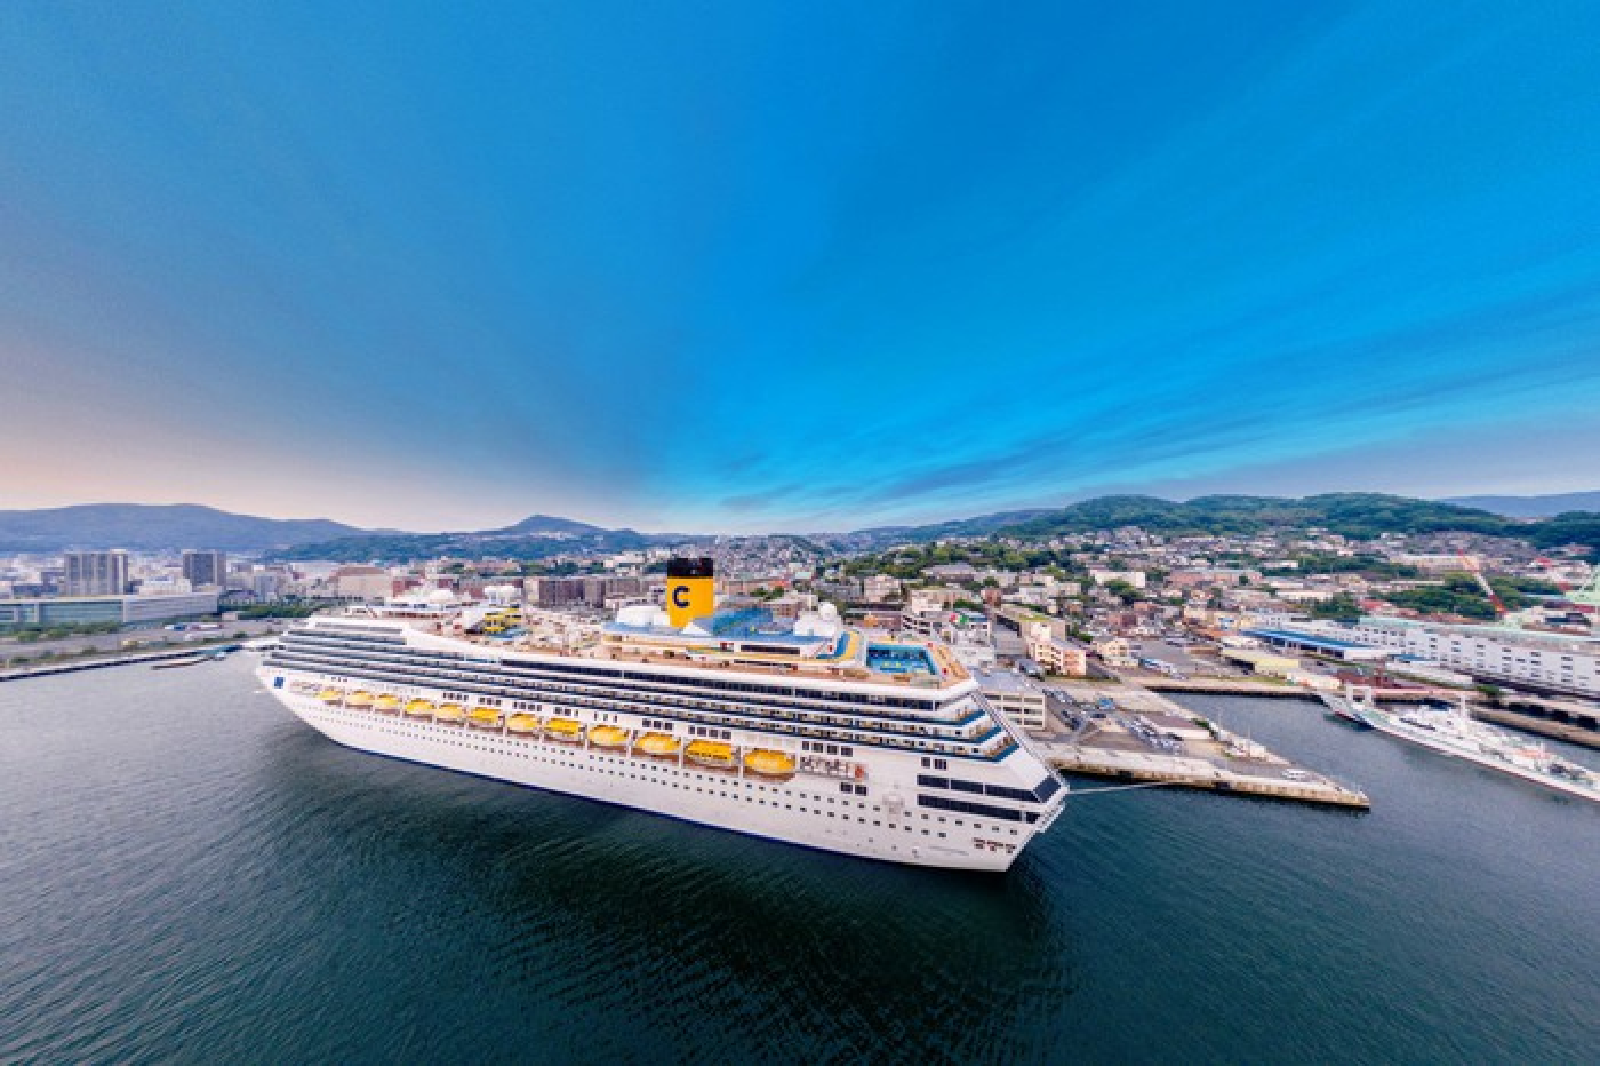 A Carnival cruise ship in the port at Nagasaki.